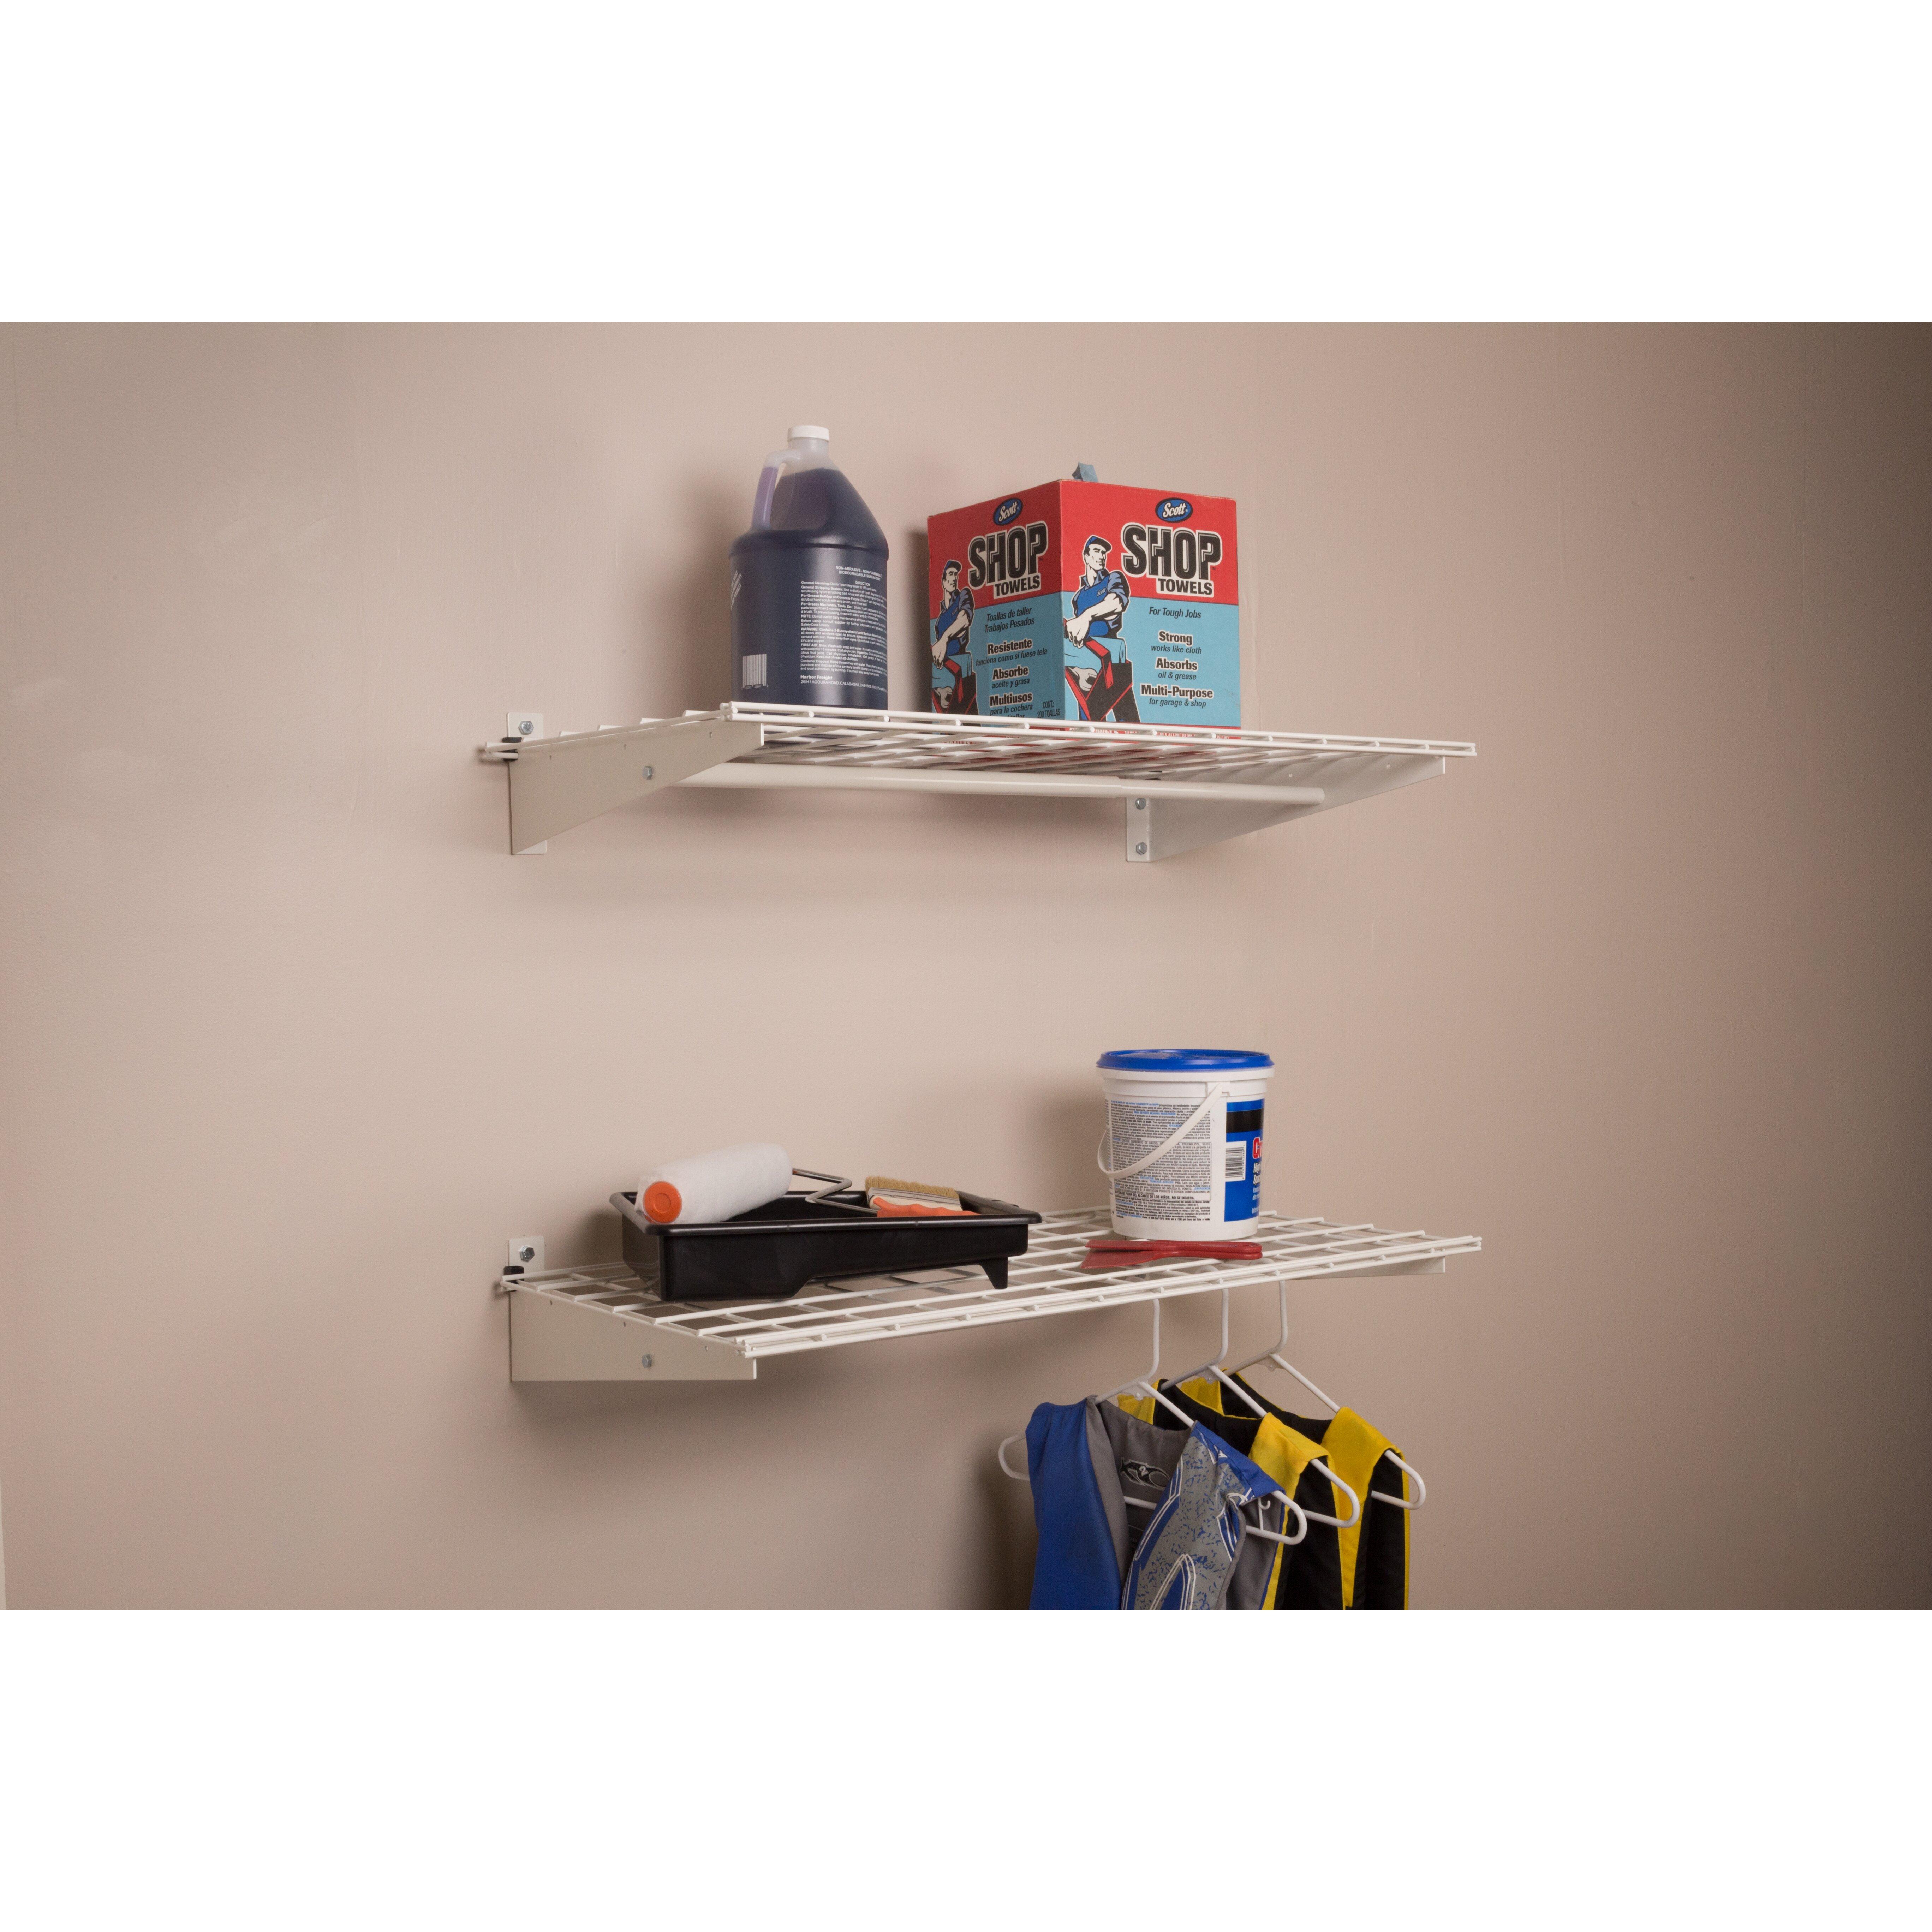 98 Wall Shelf With Hanging Rod Furniture Splendid